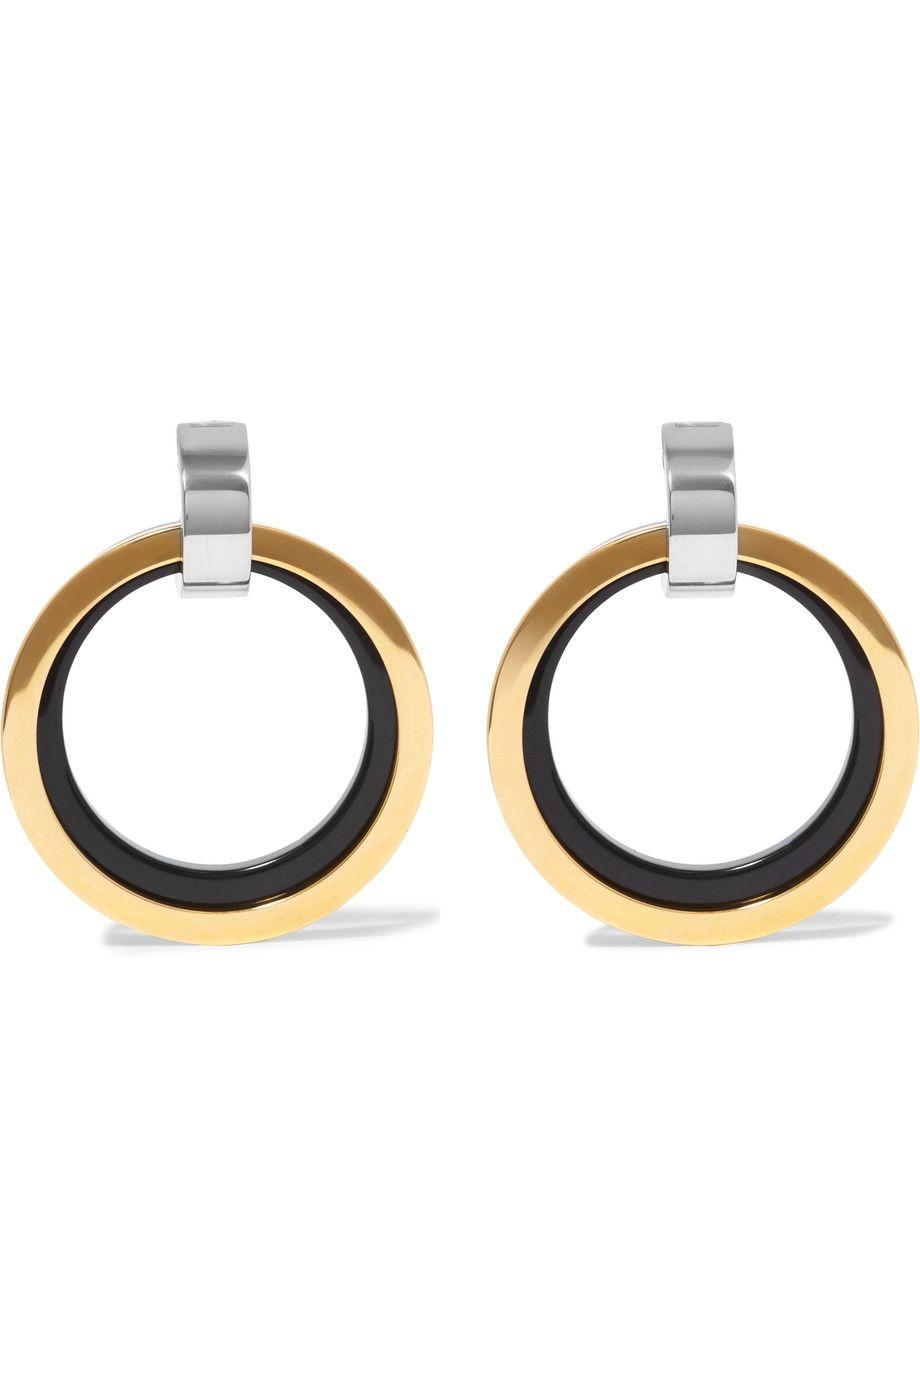 "<p>Marni, Gold and Silver Enamel Clip Earrings, $540; <a href=""https://www.net-a-porter.com/us/en/product/807872/marni/gold-and-silver-tone-enamel-clip-earrings"">net-a-porter.com</a></p>"